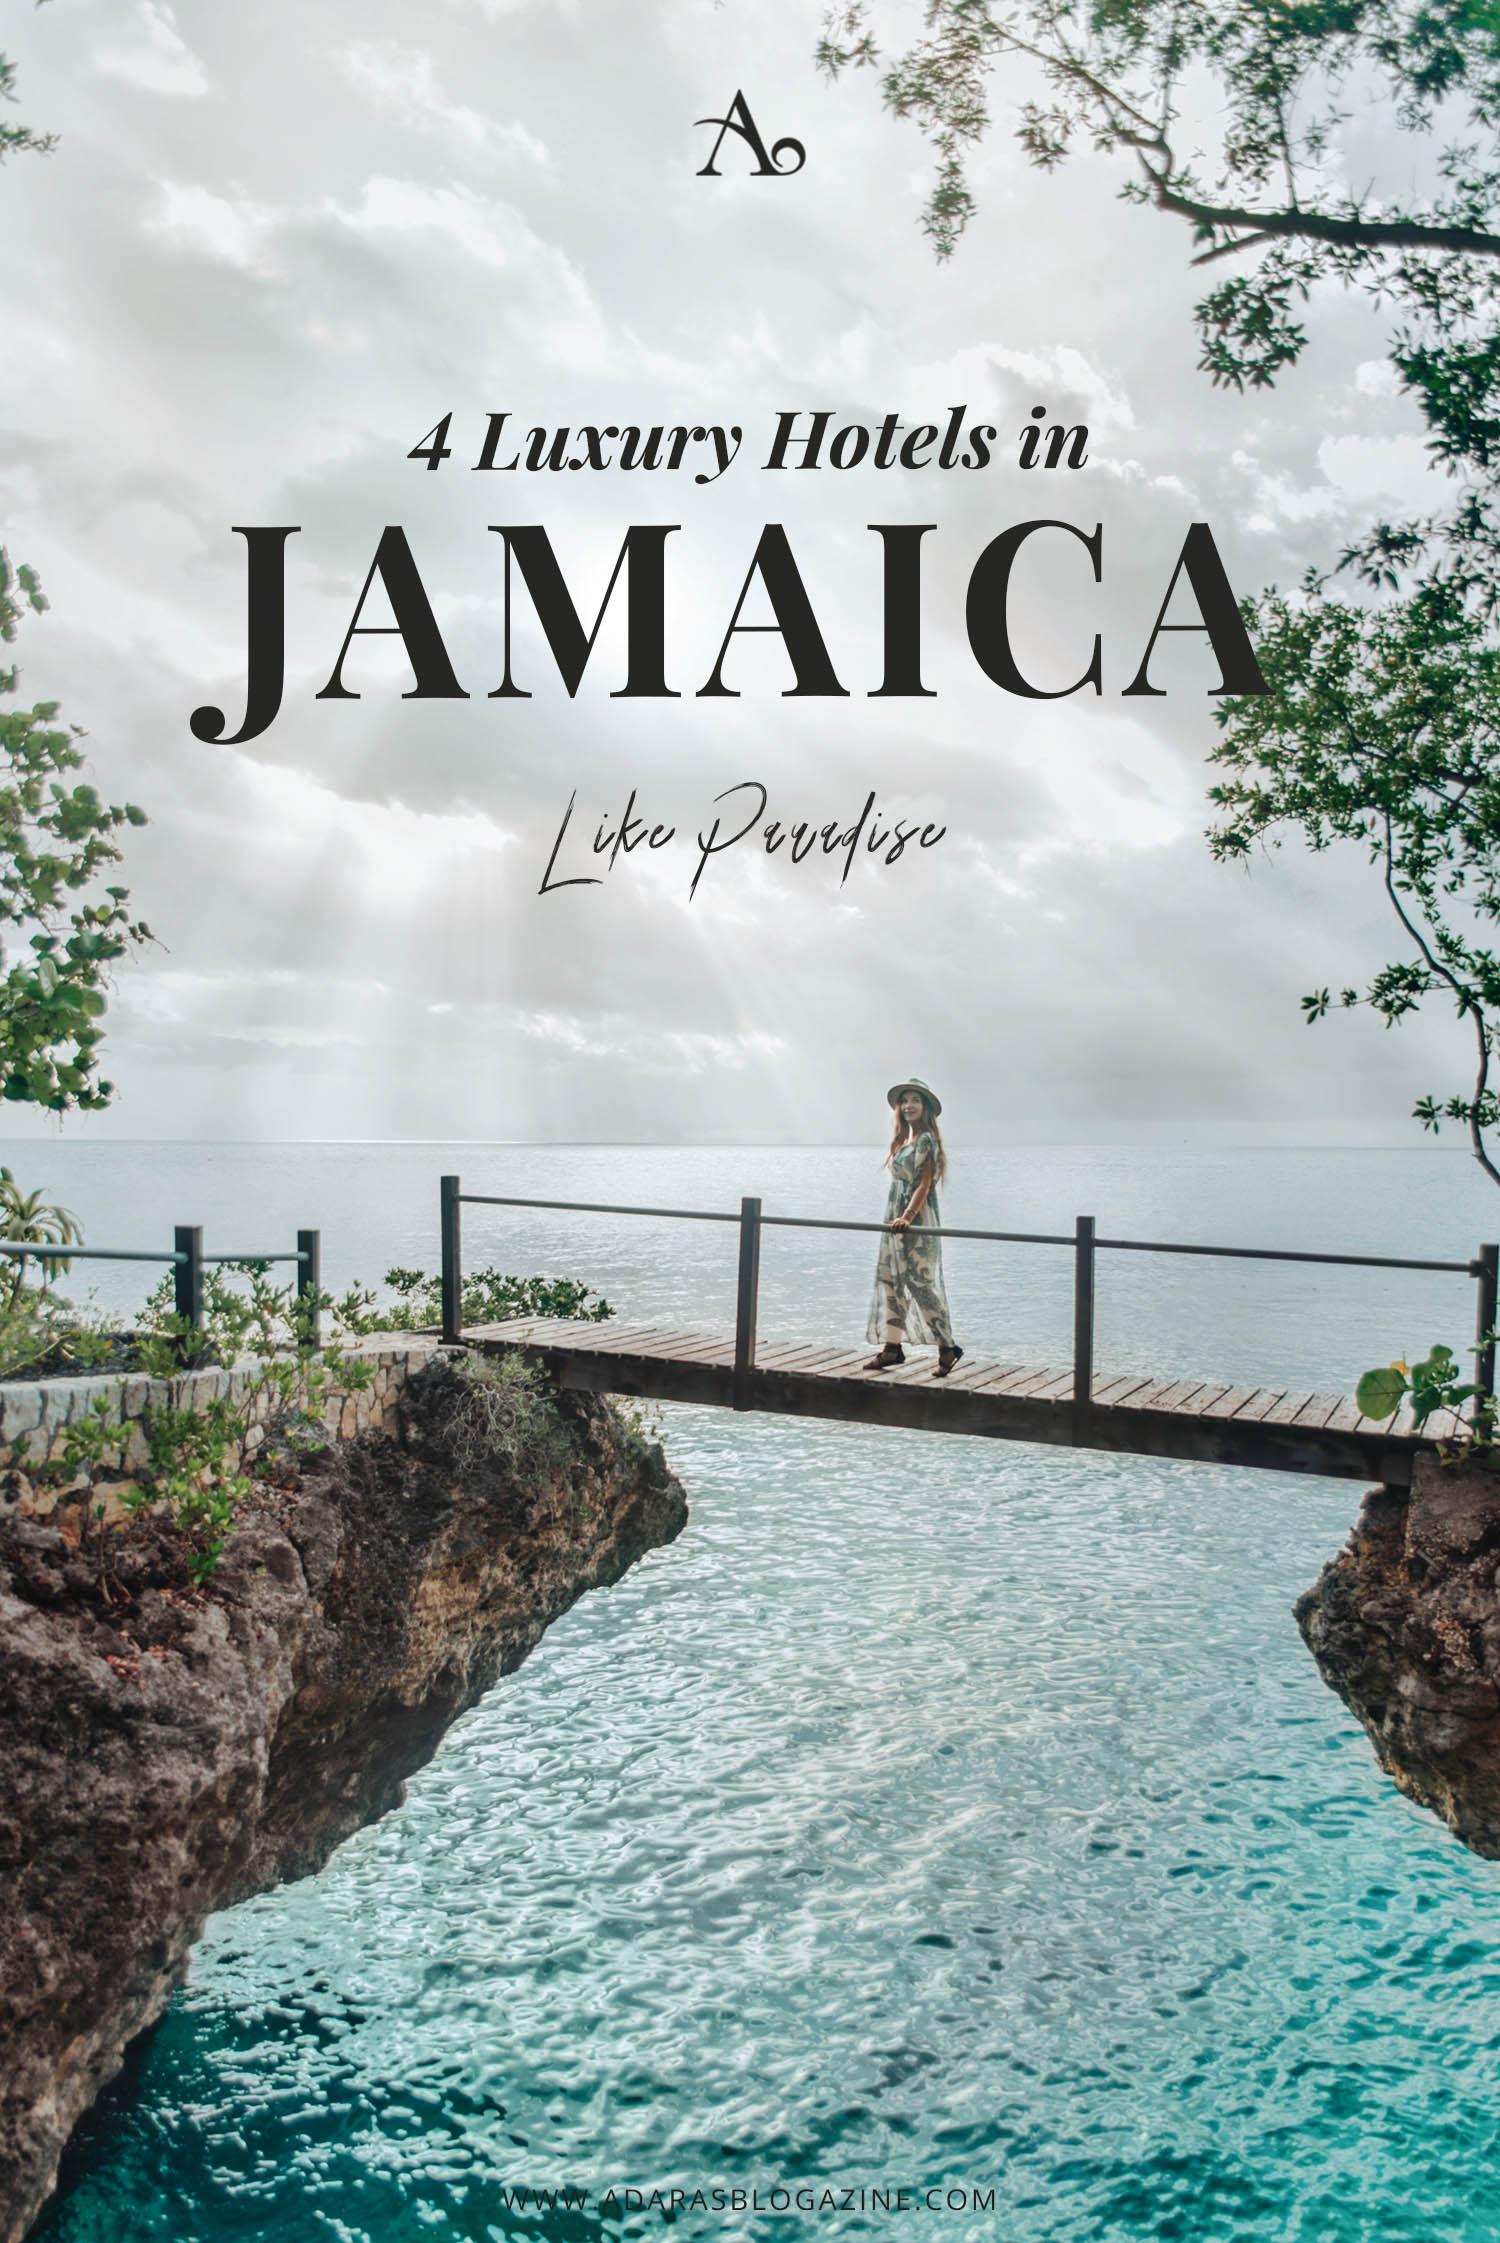 4 Luxury Hotels in Jamaica